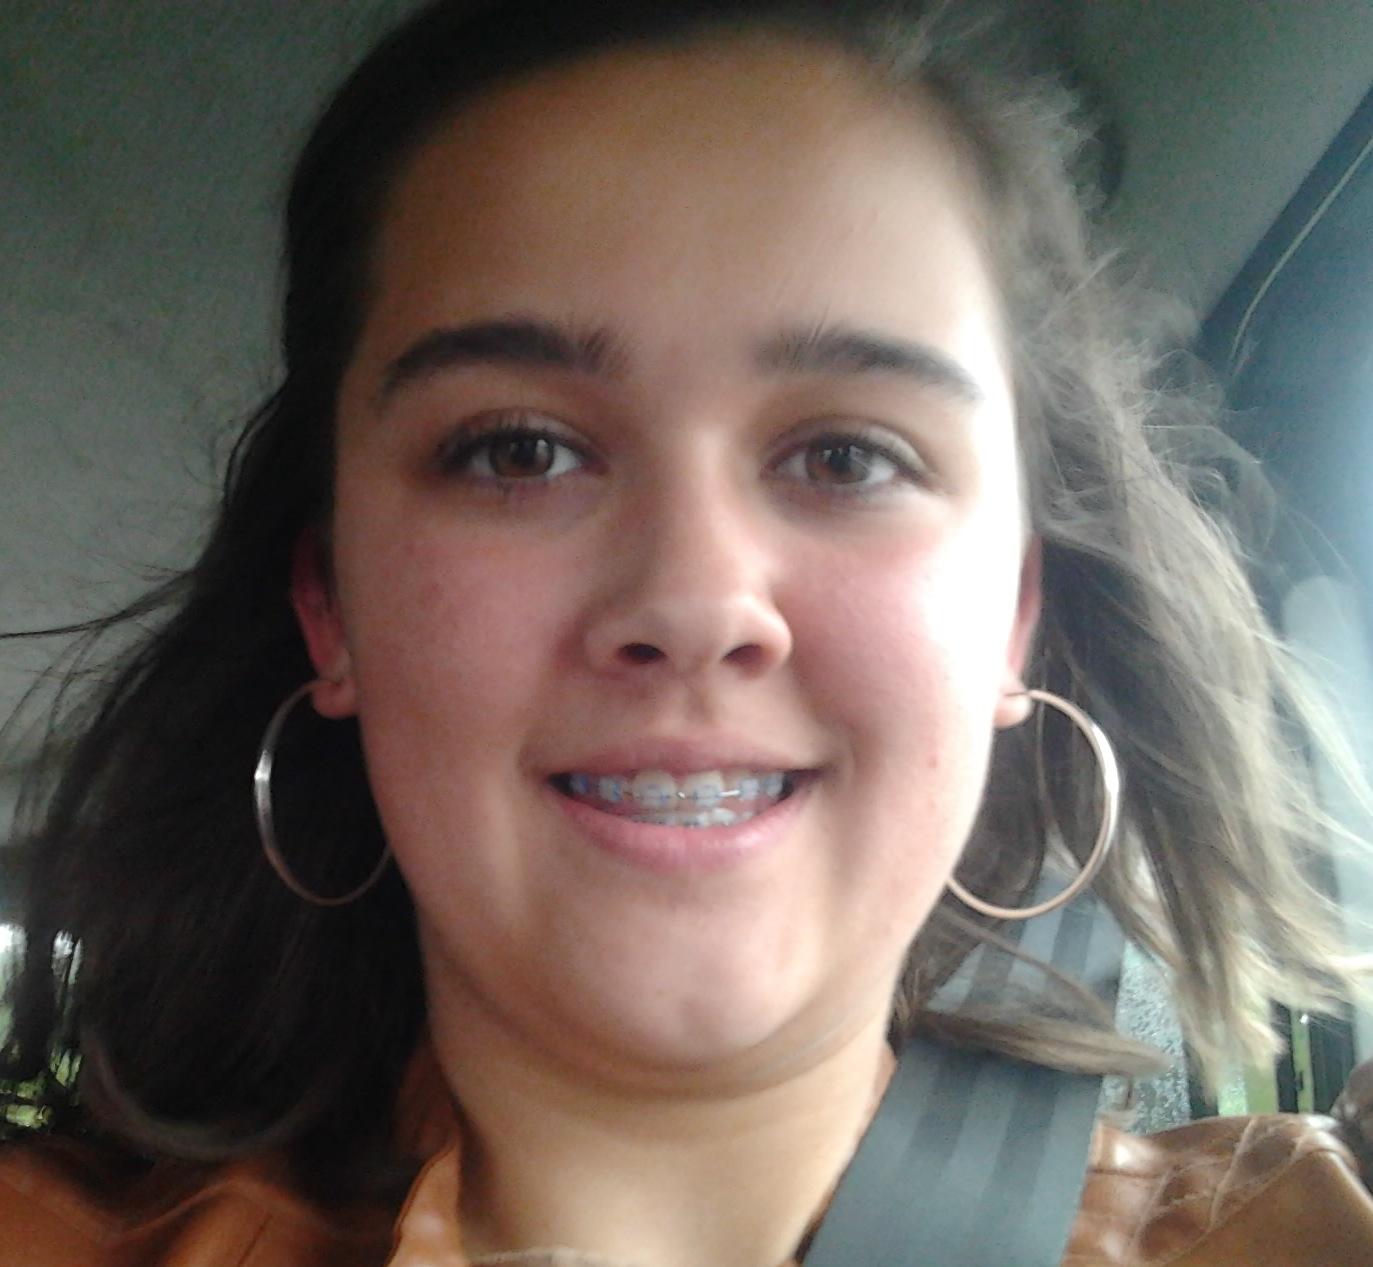 Marion Avec son appareil dentaire.